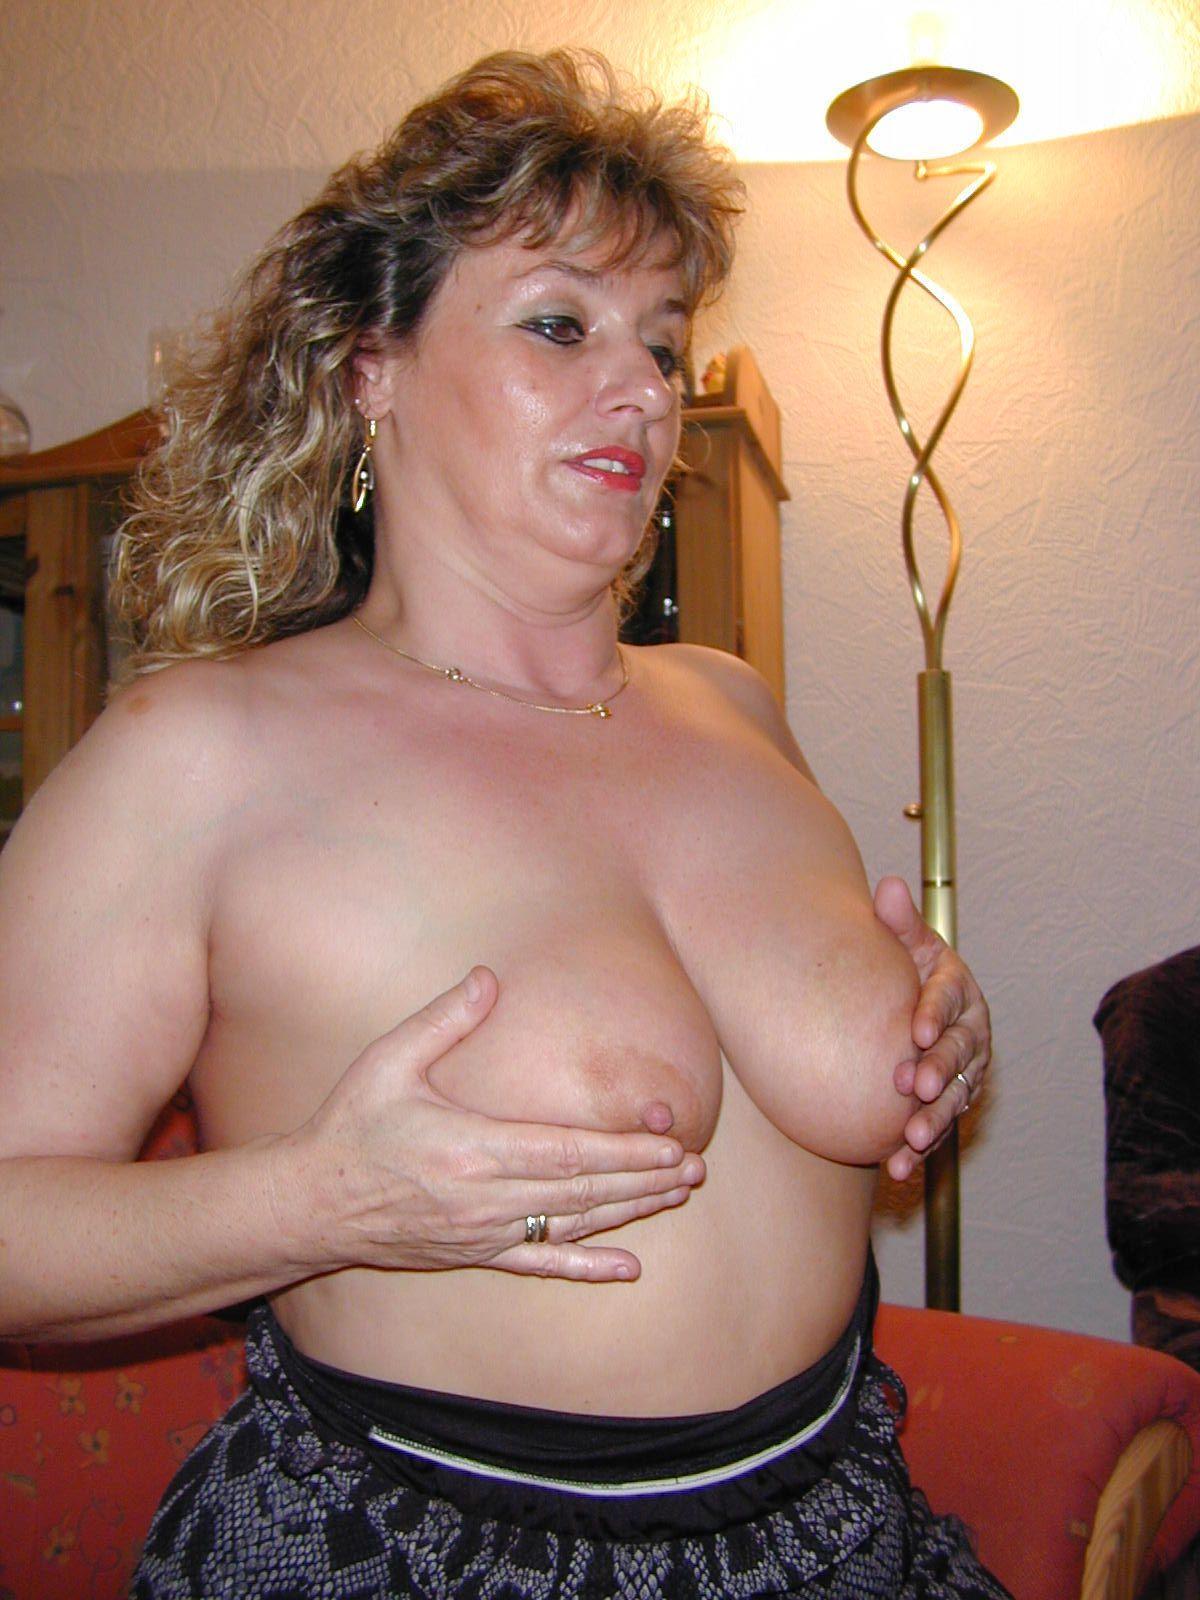 This mature milf gf porn galleries please